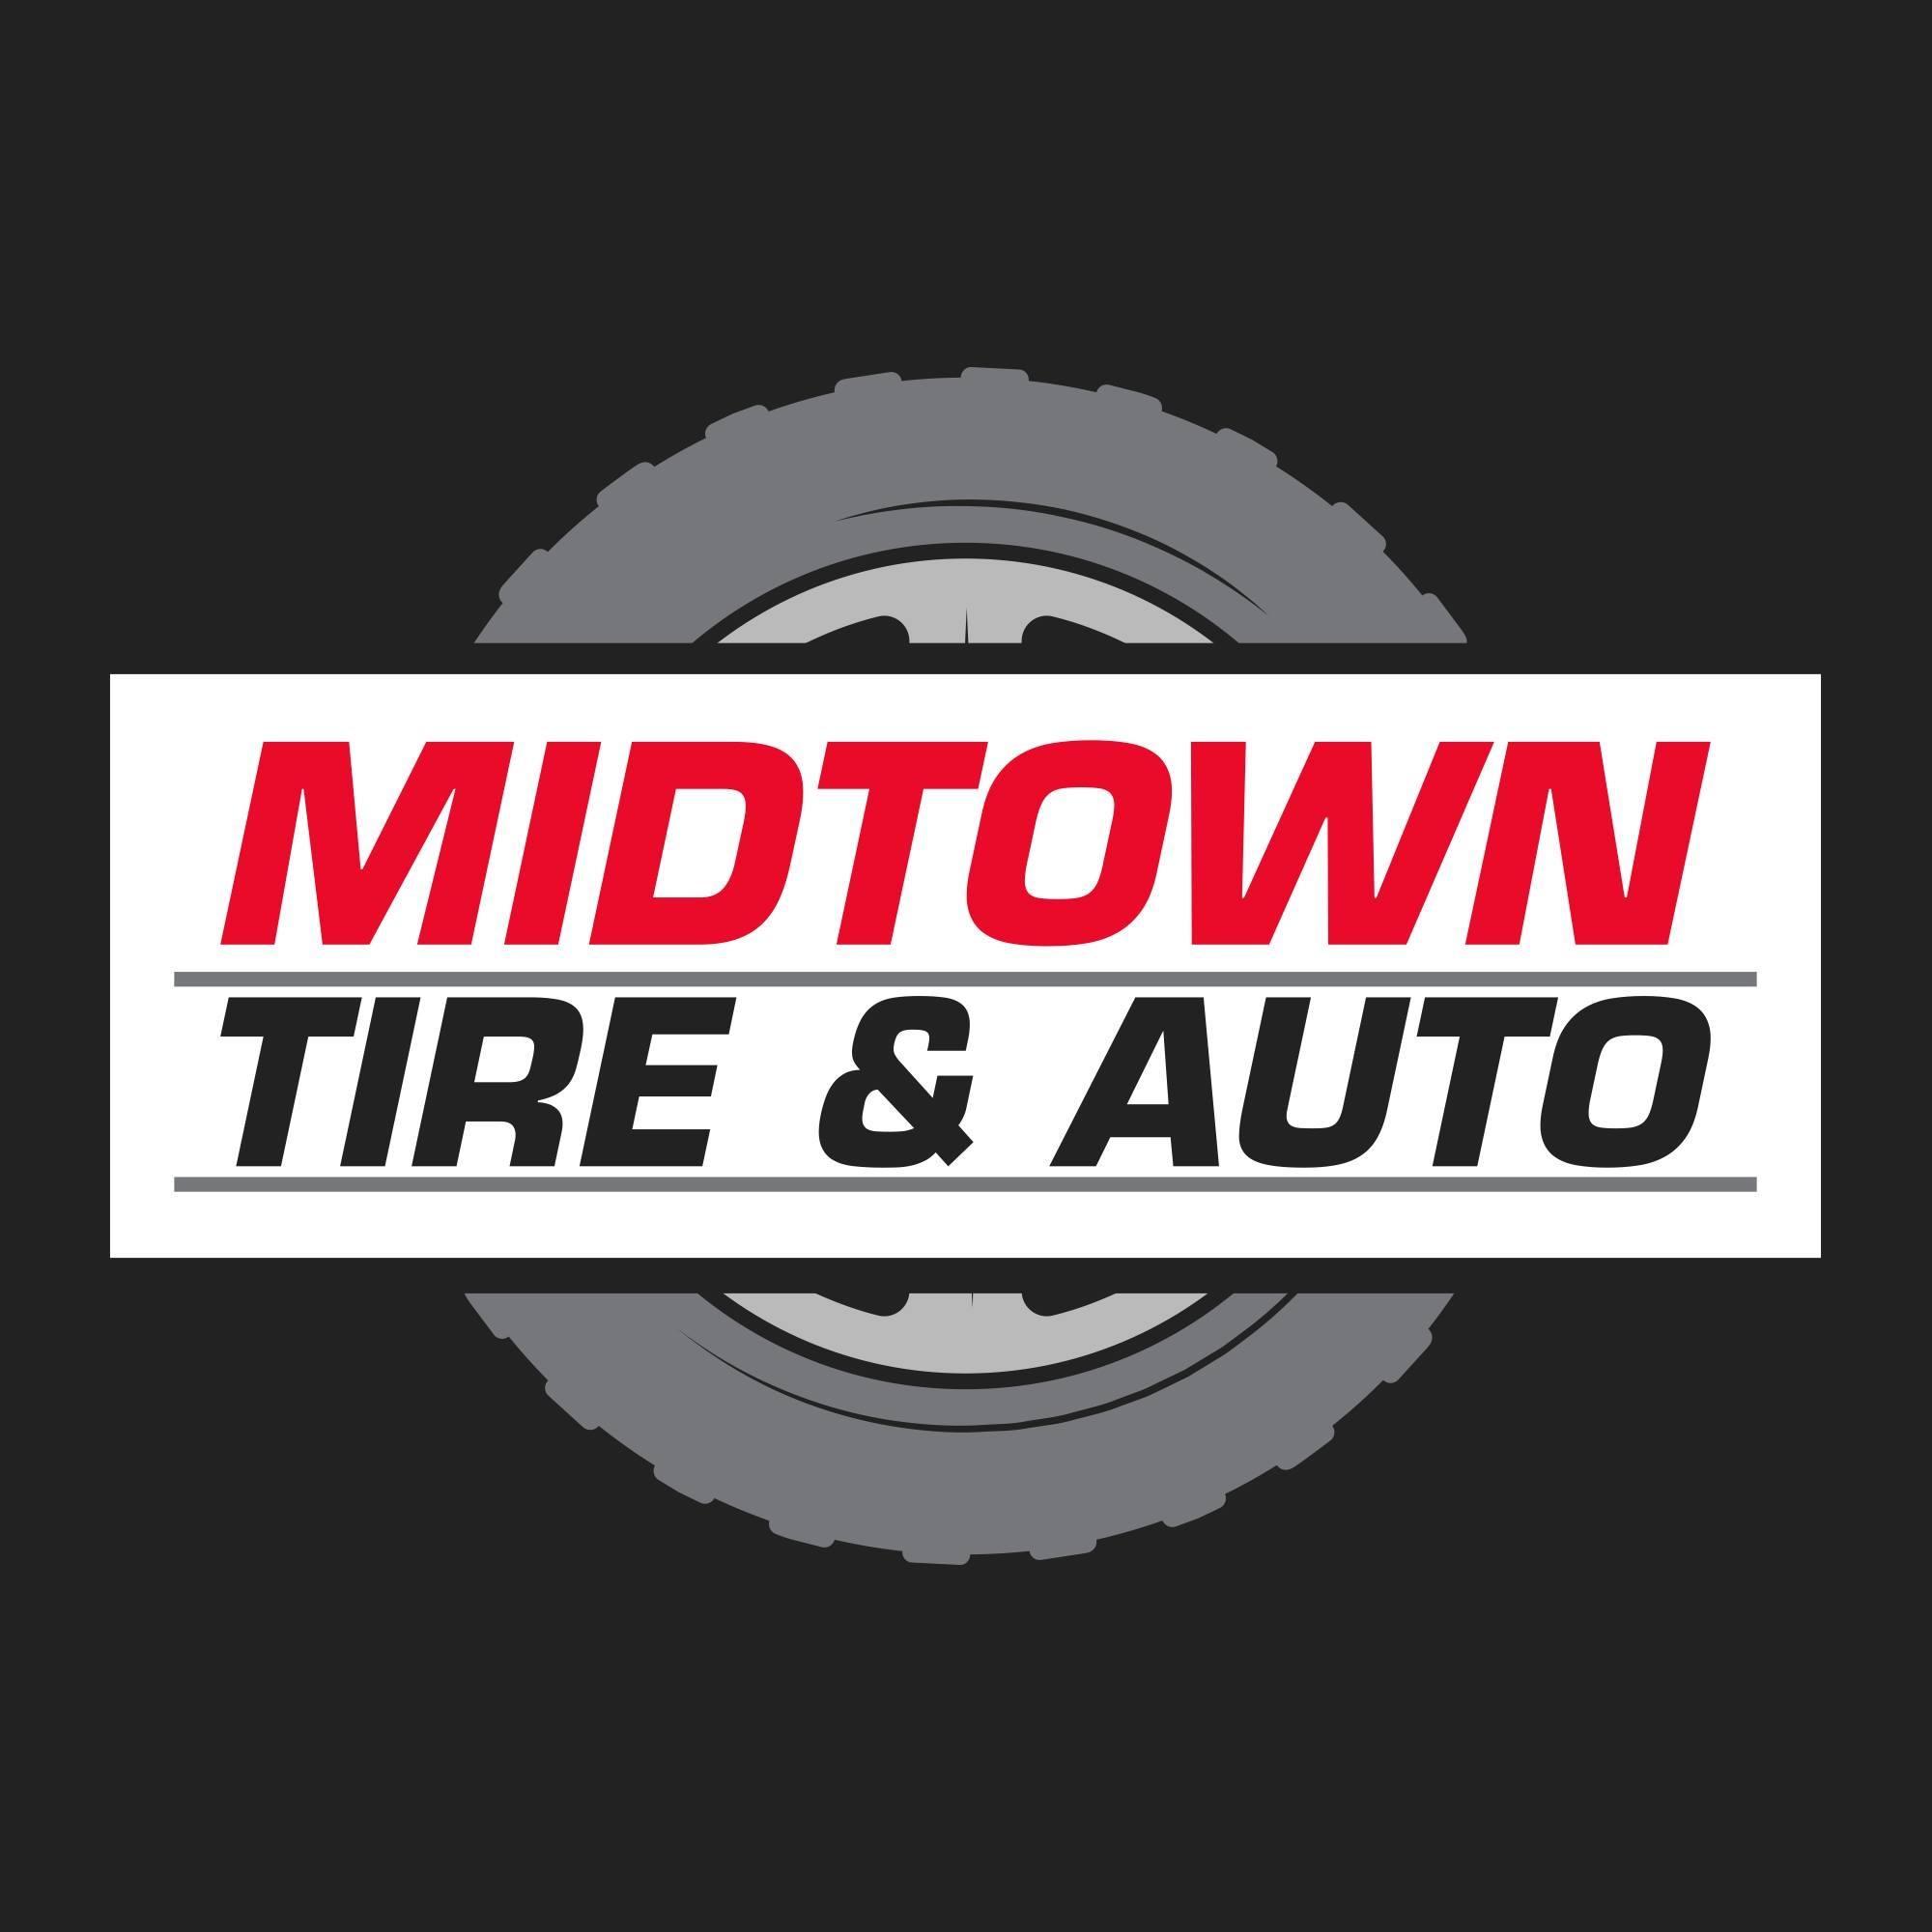 Midtown Tire & Auto